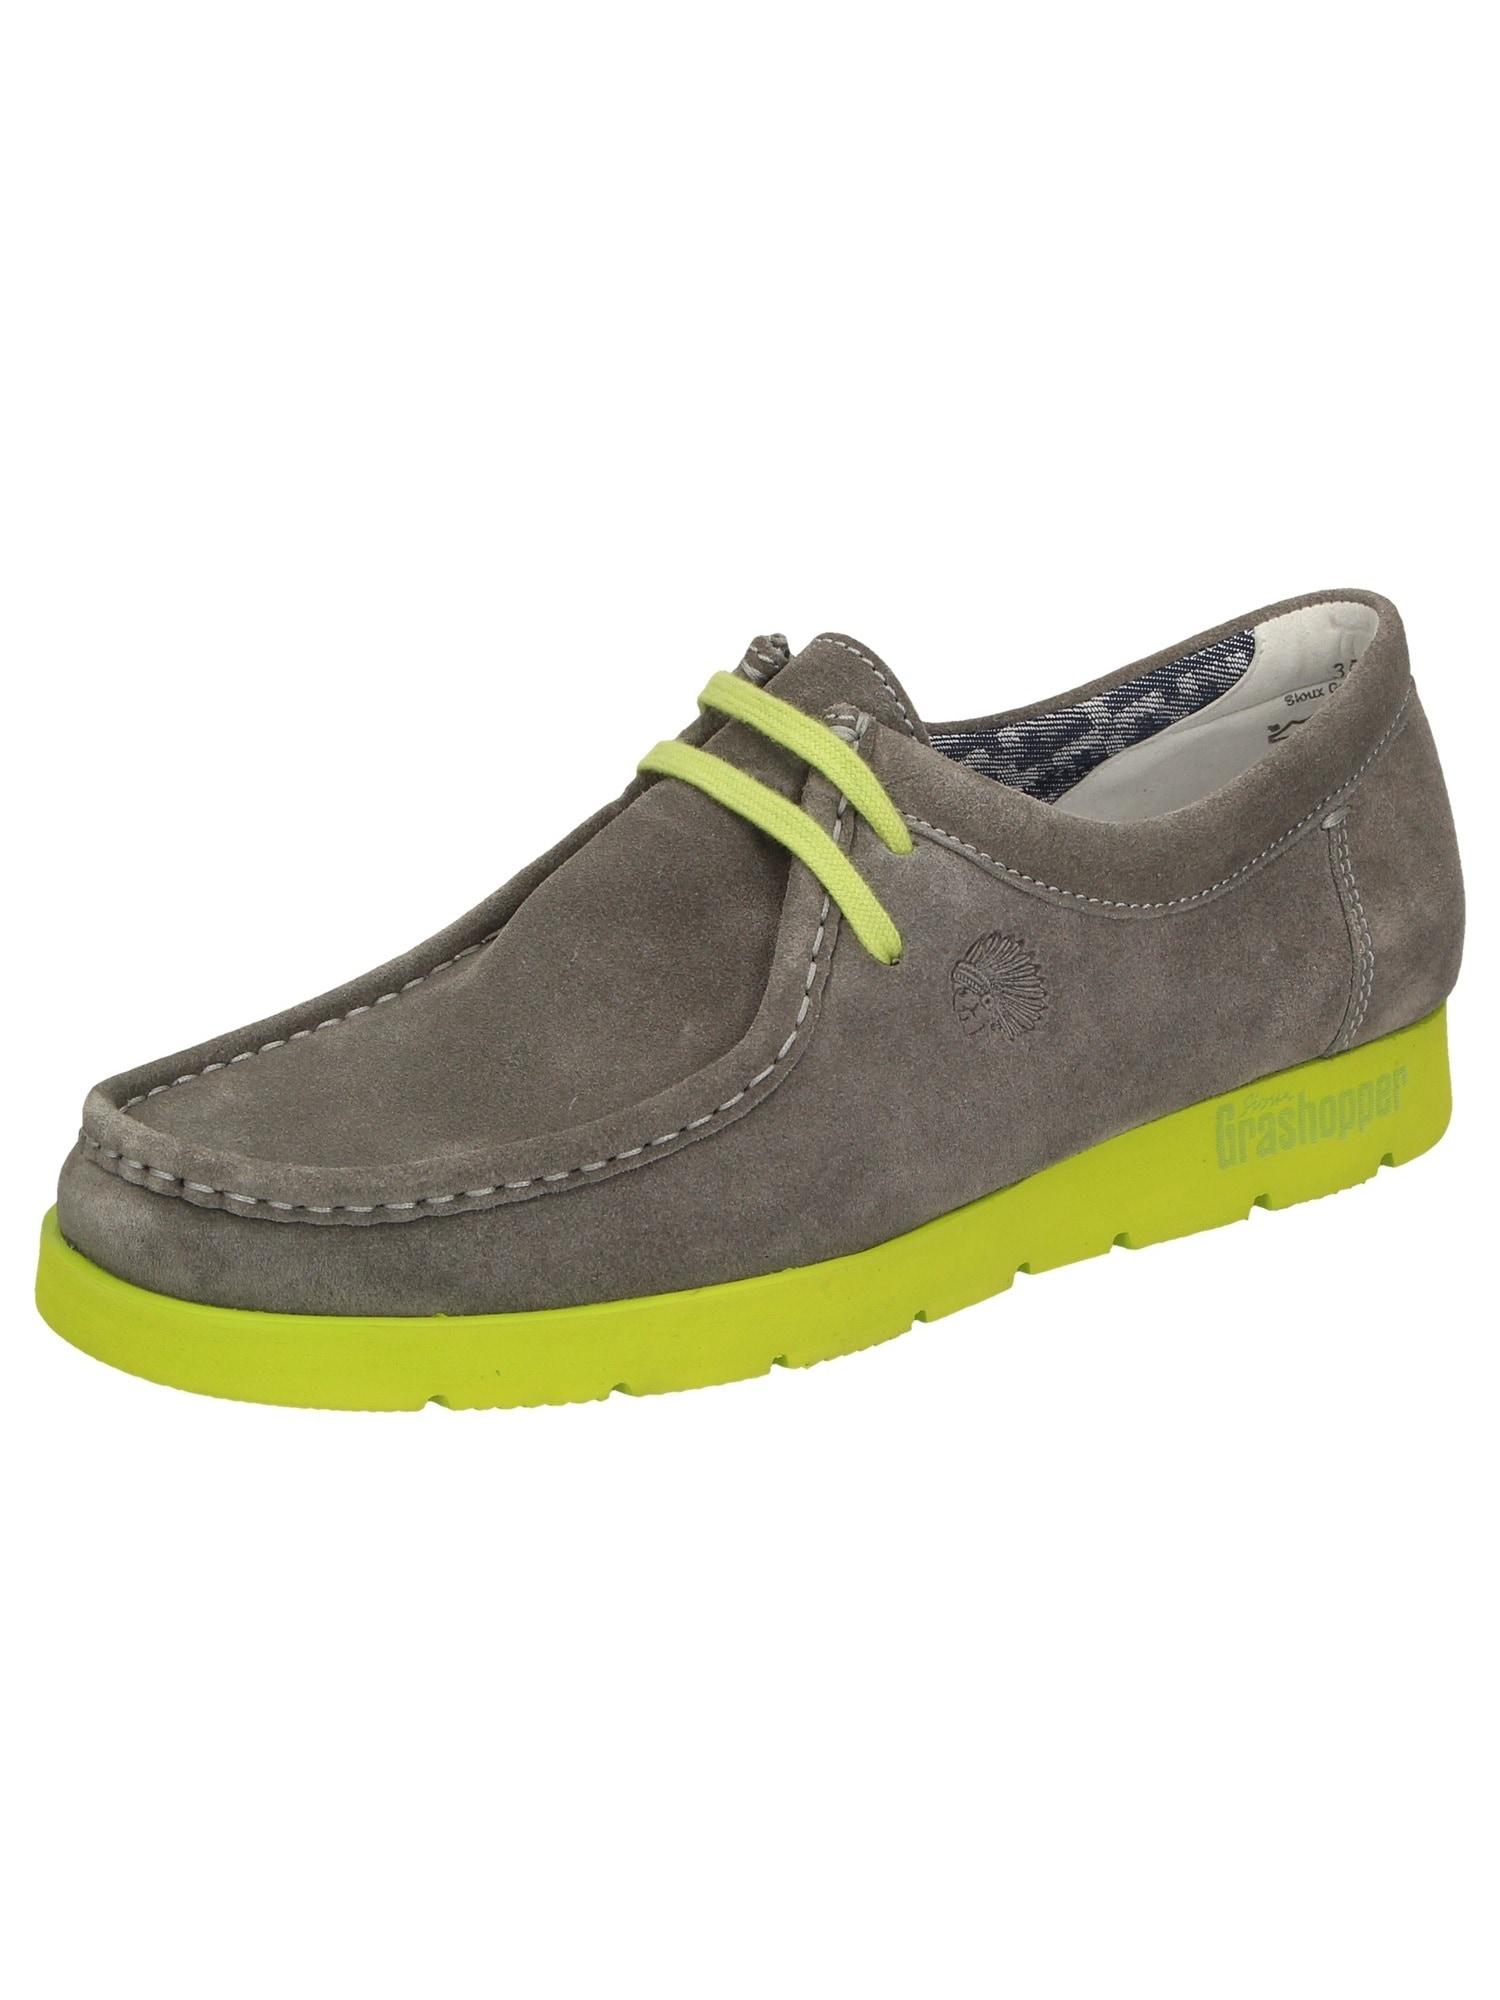 Mokassin 'Grash-H191-41' | Schuhe > Mokassins | Taupe | SIOUX